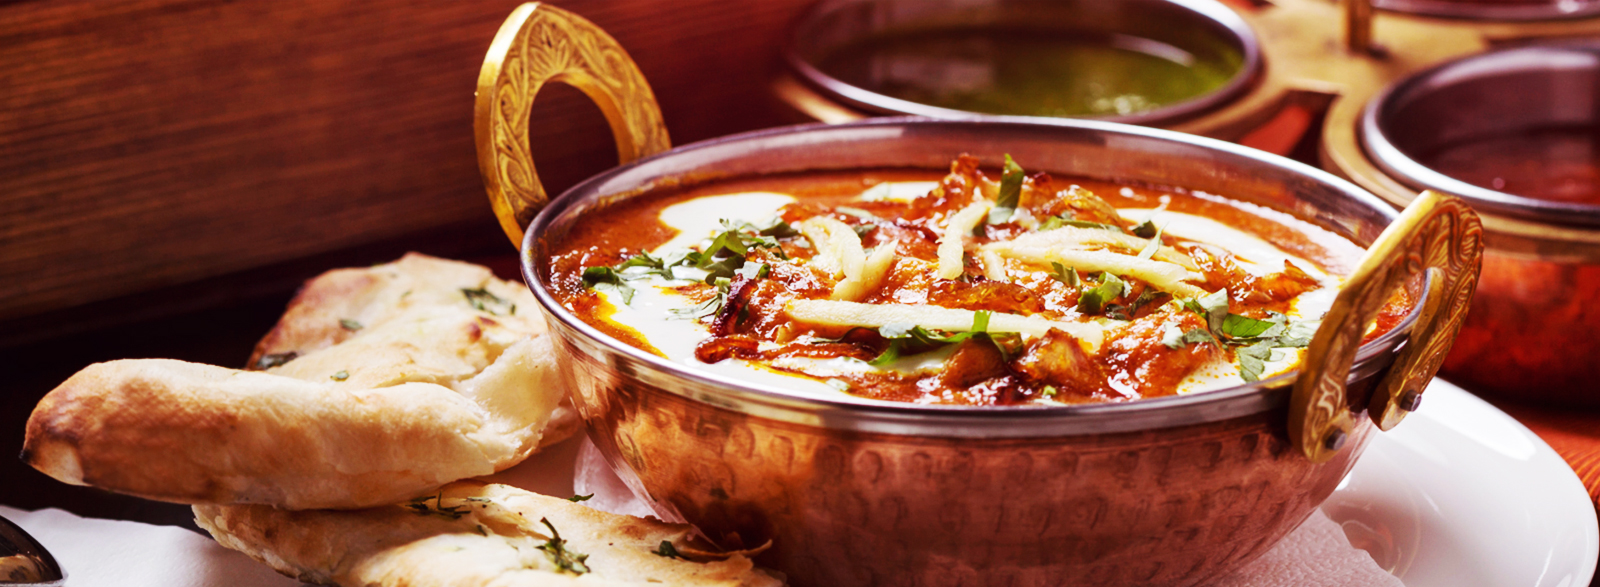 Saffron cuisine for Ashoka indian cuisine san francisco